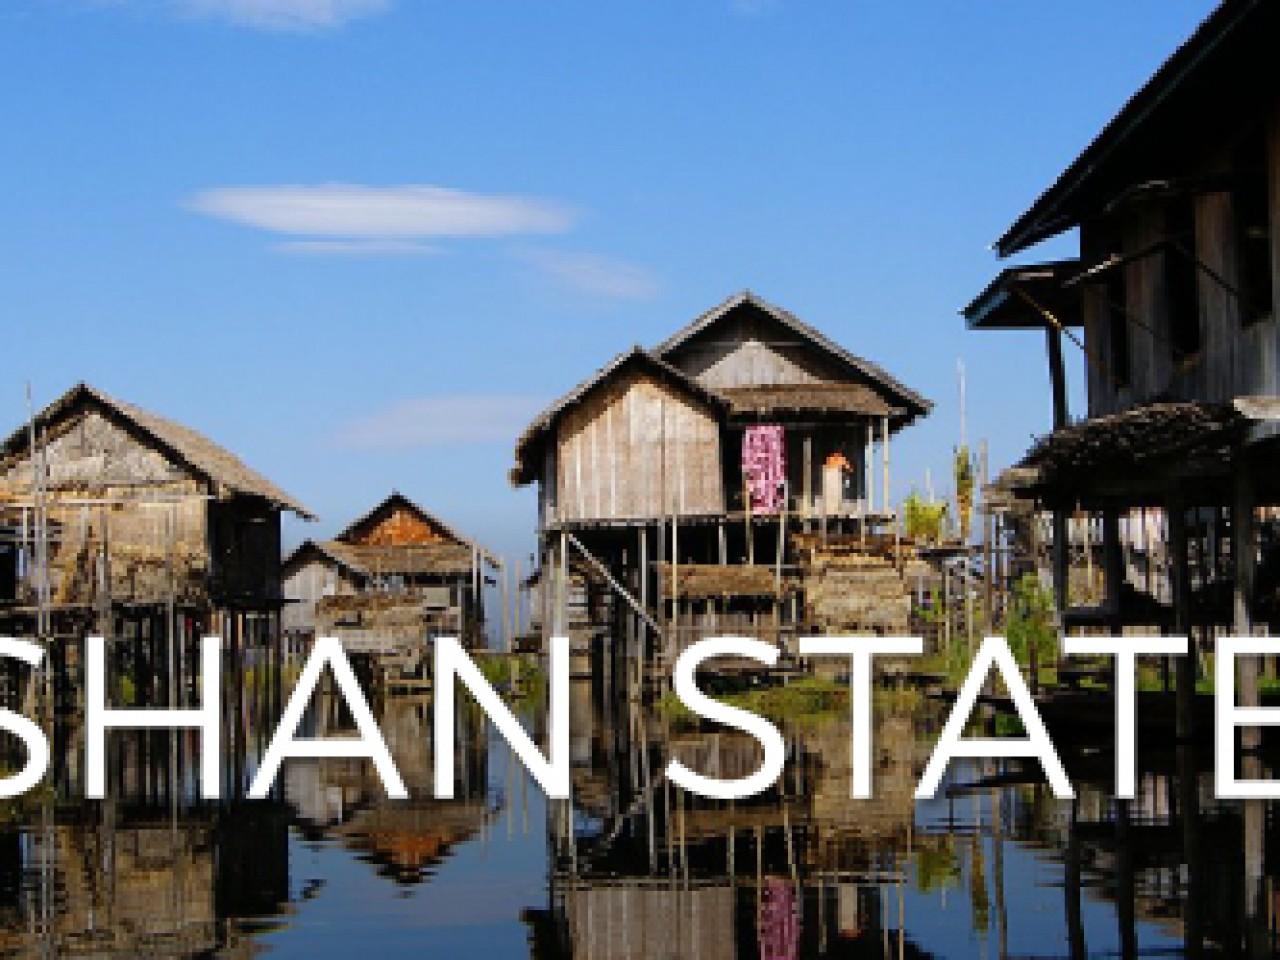 Stato Shan